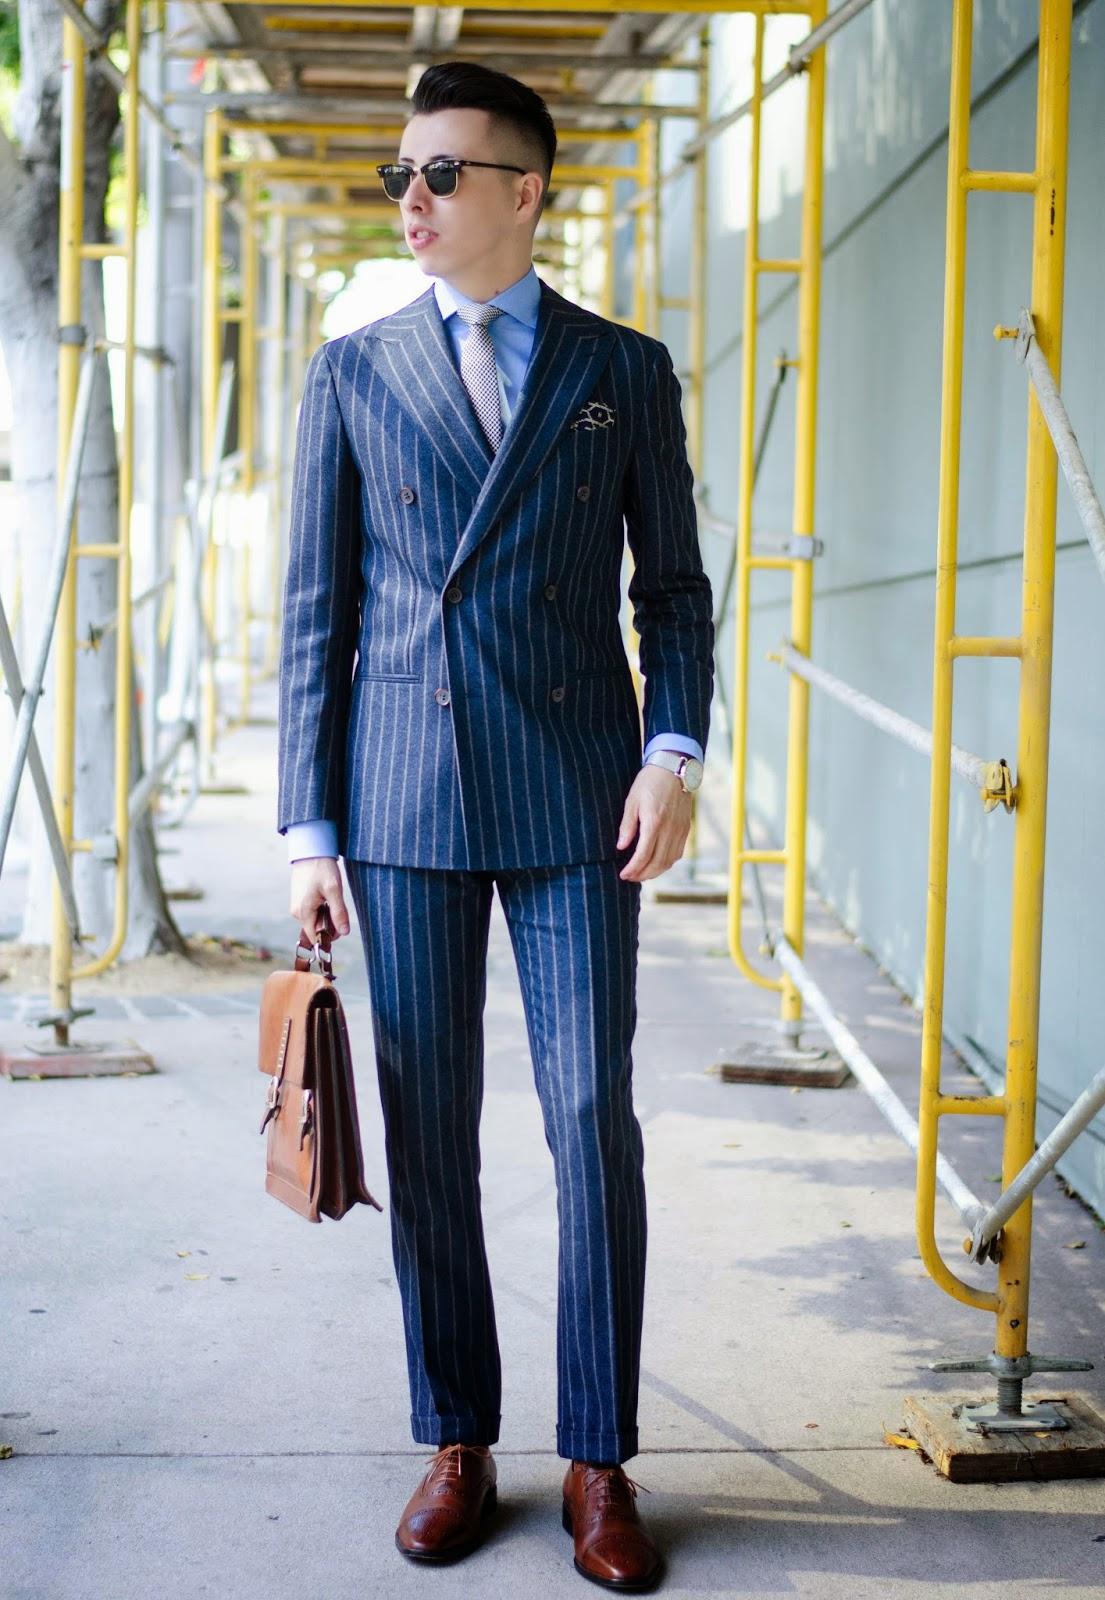 double-breasted-blazer-dress-shirt-dress-pants-brogues-briefcase-tie-original-2029